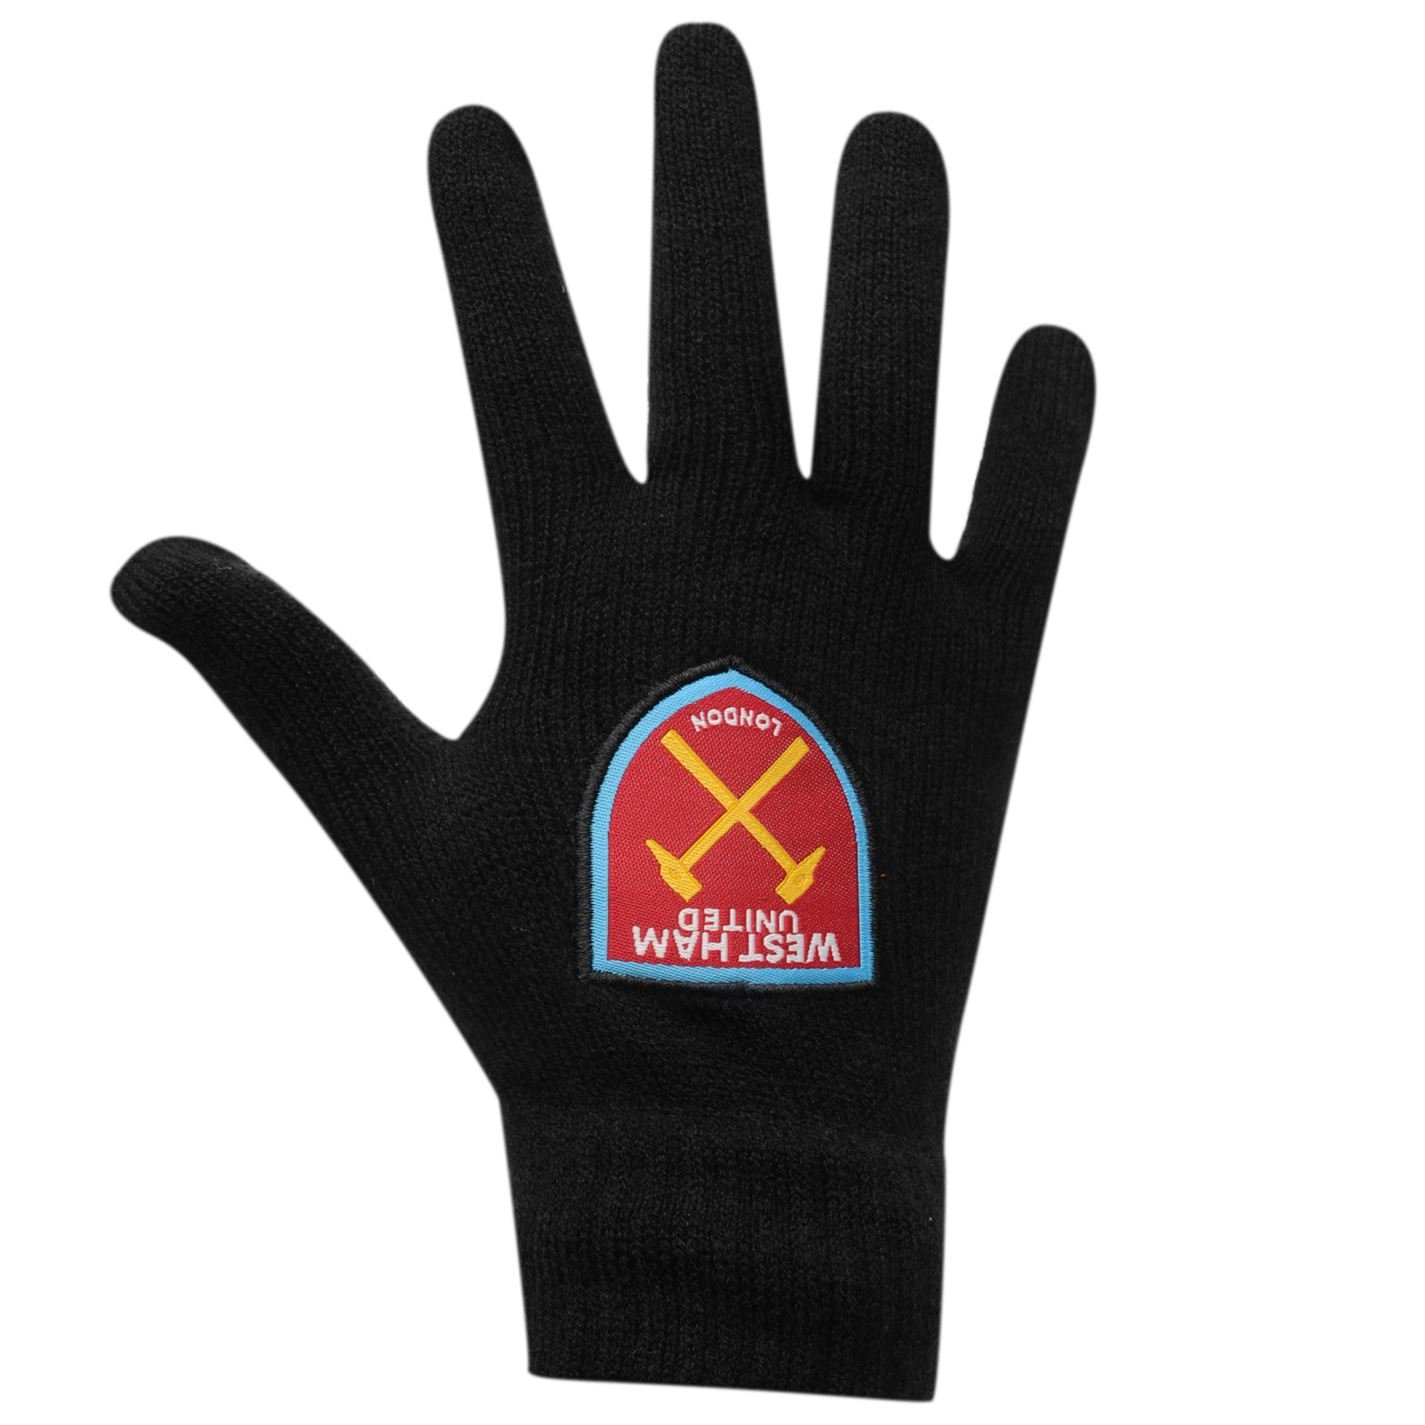 Official Football Merchandise Gants en tricot /Équipe de foot